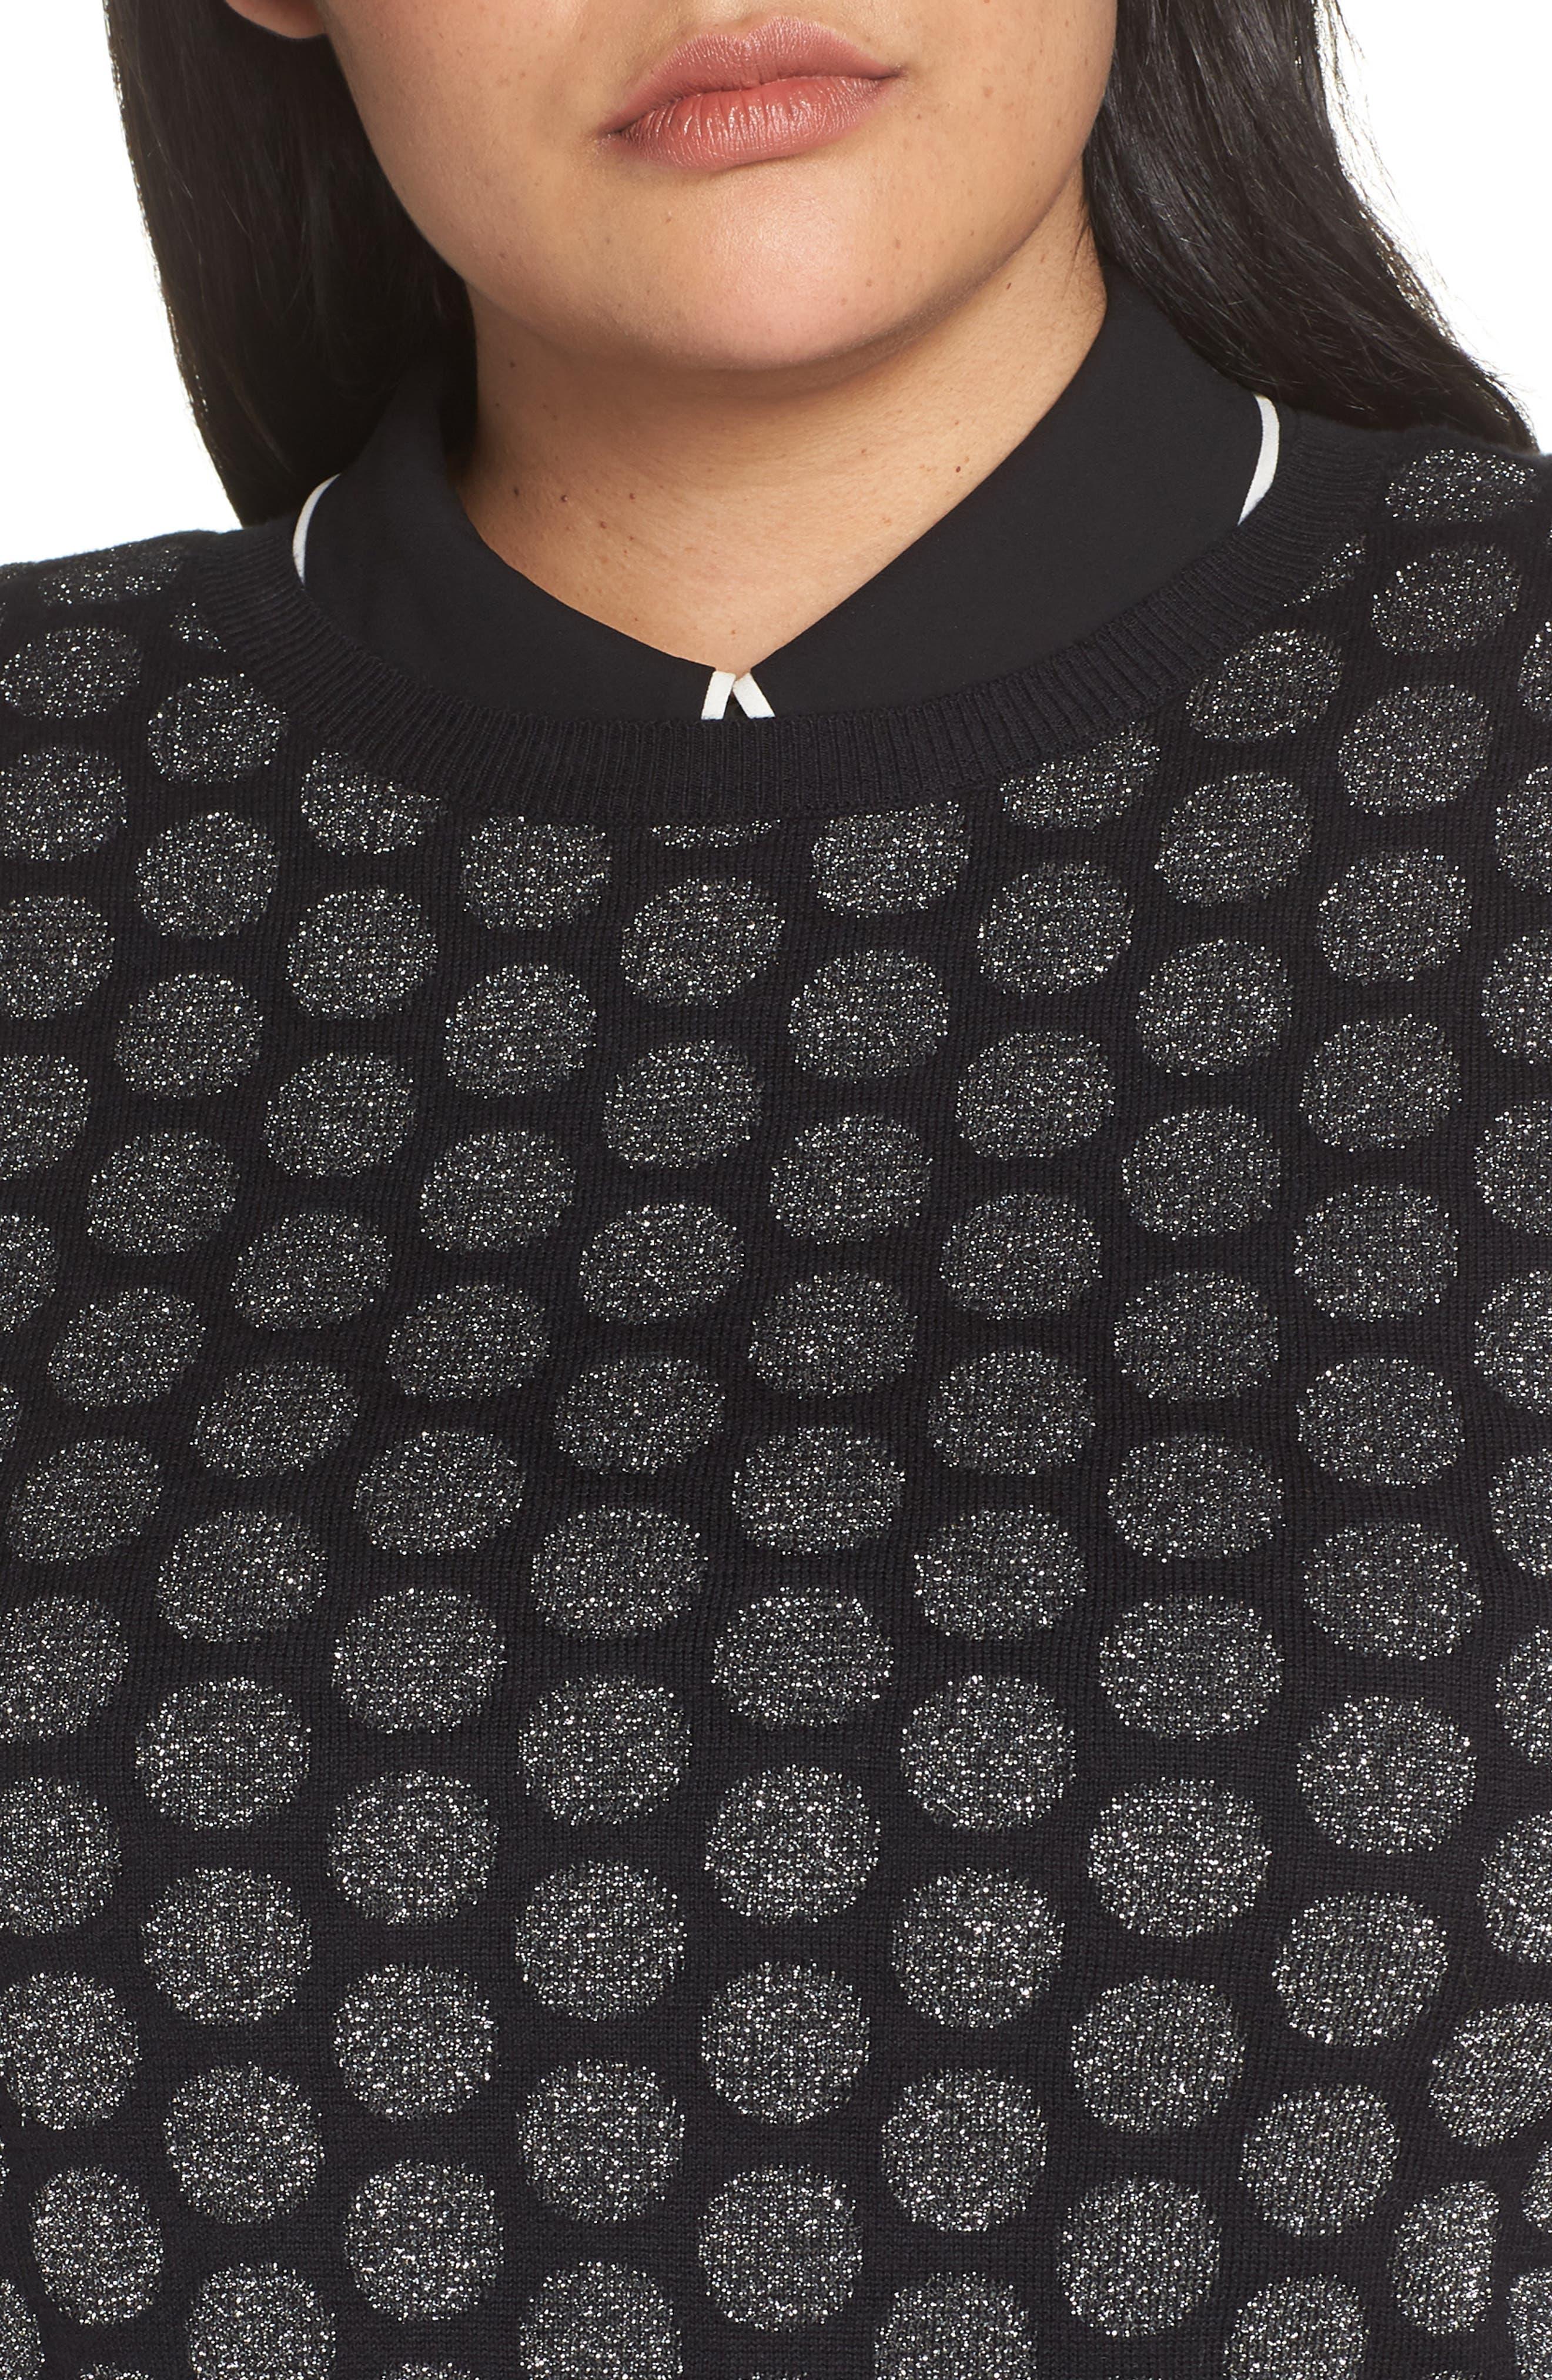 x Atlantic-Pacific Shimmer Dot Sweater,                             Alternate thumbnail 4, color,                             BLACK